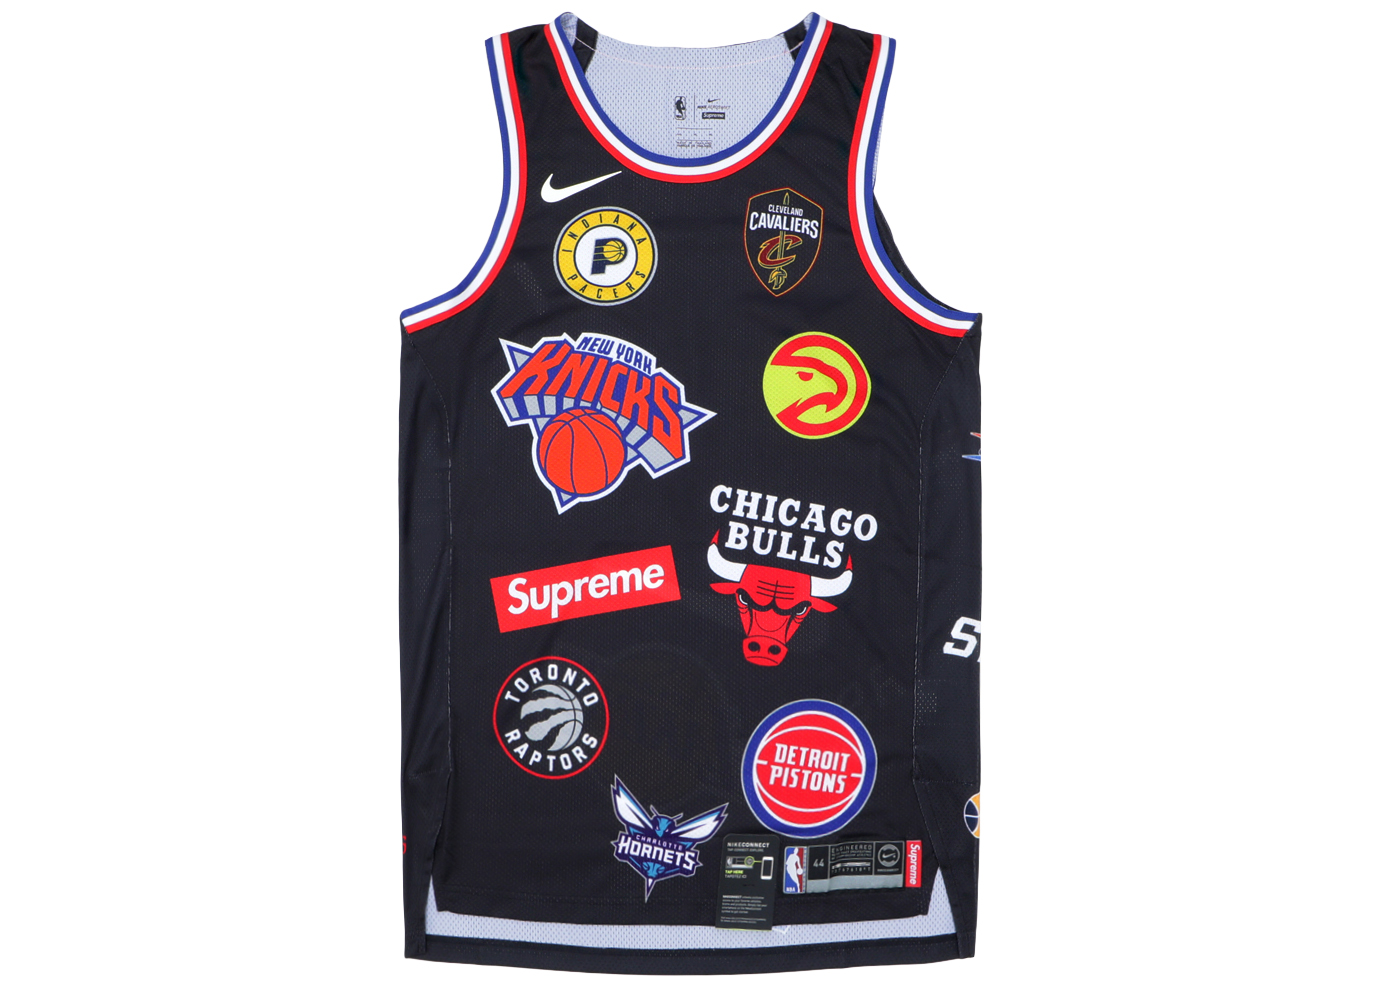 Supreme Nike/NBA Teams Authentic Jersey Black